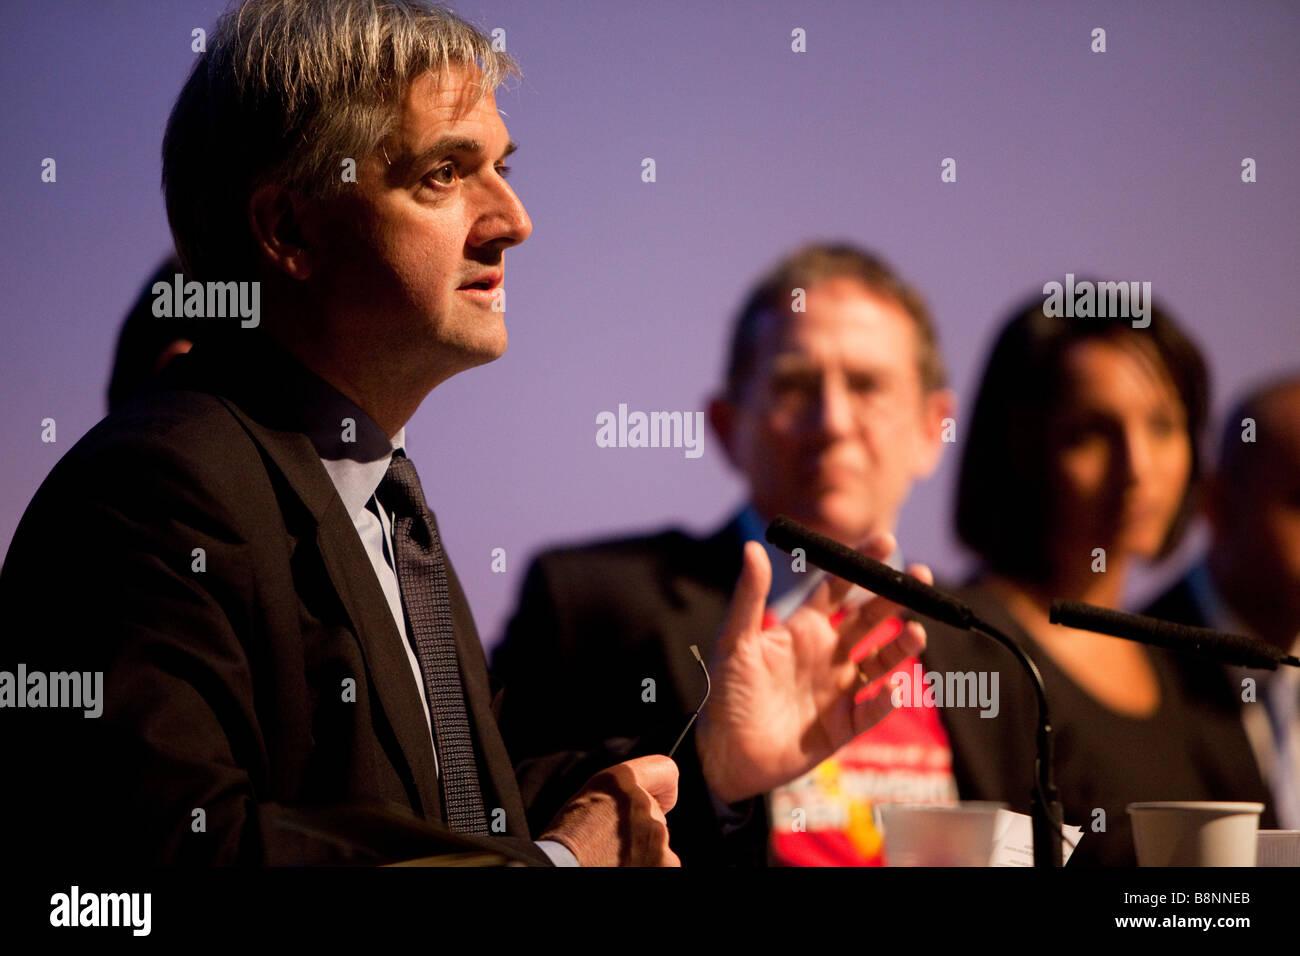 The Convention on Modern Liberty London England 28th February 2009 Chris Huhne MP LibDem spokesman speaking - Stock Image